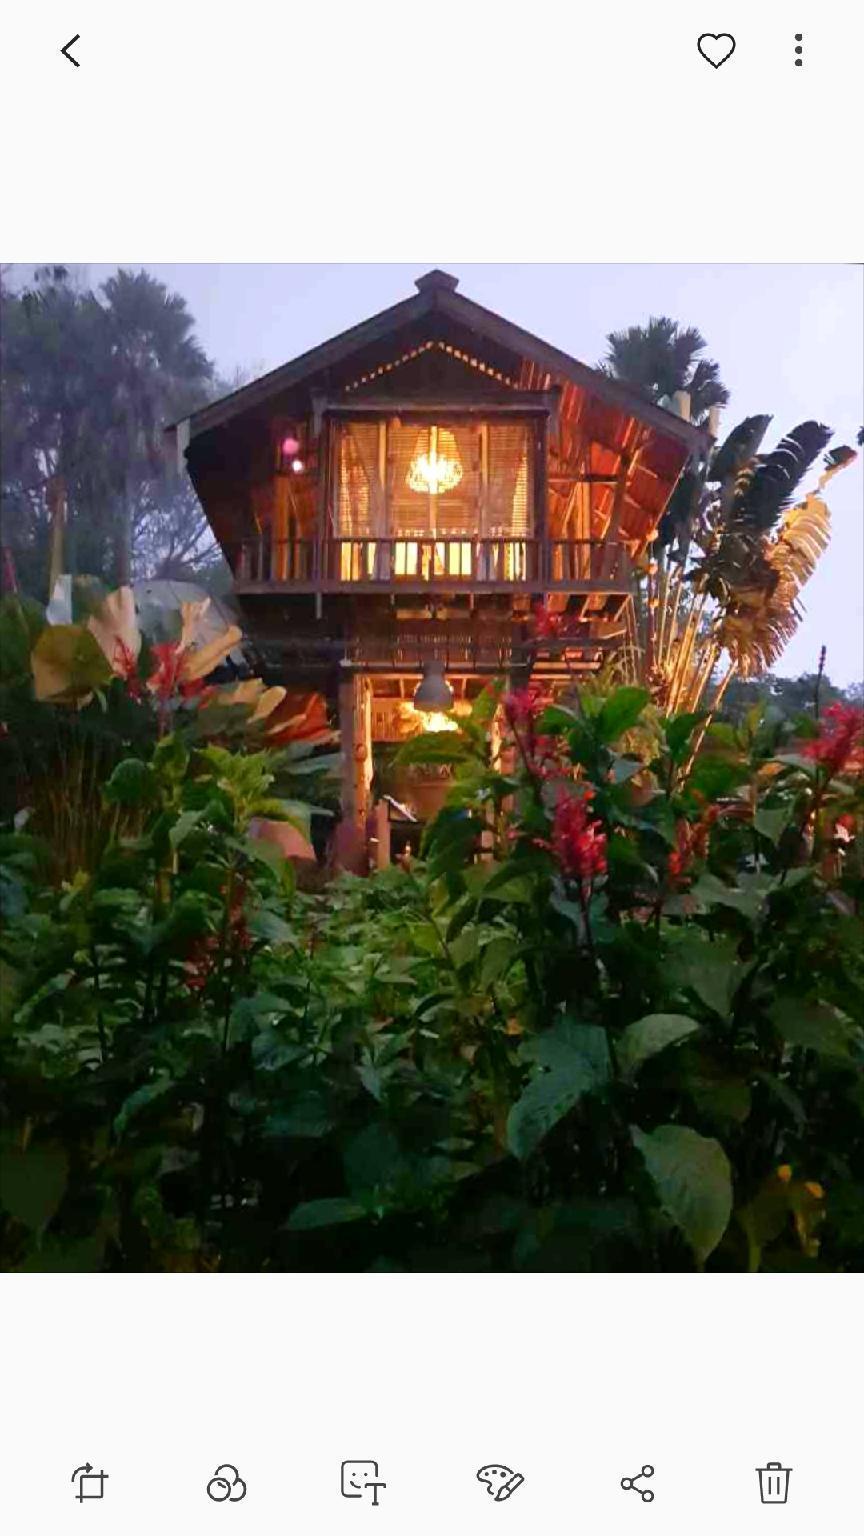 Baan Pordee at Deepor Luxury Tented Camp บ้านเดี่ยว 1 ห้องนอน 2 ห้องน้ำส่วนตัว ขนาด 120 ตร.ม. – แม่ริม